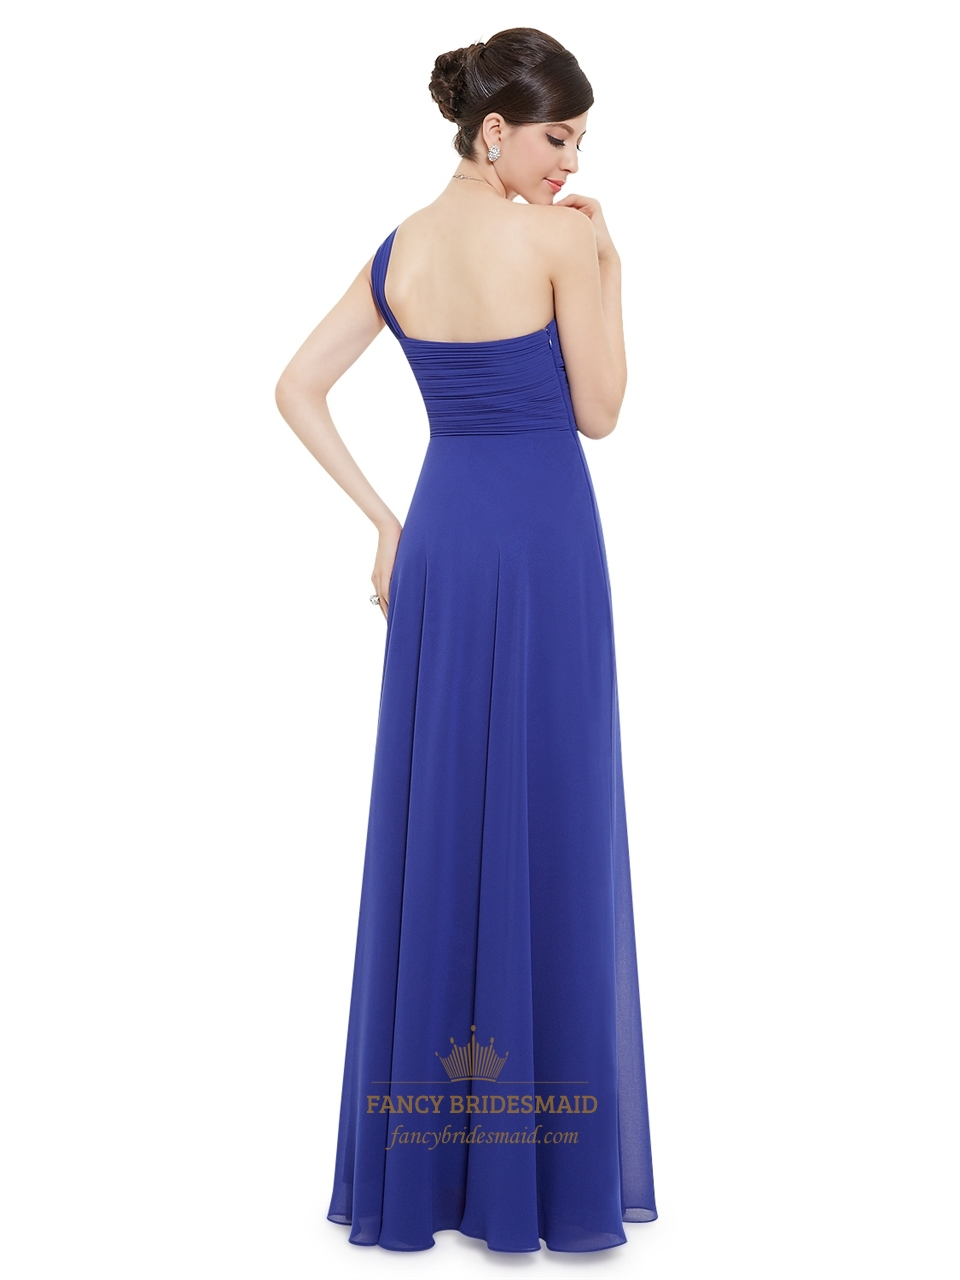 royal blue chiffon one shoulder long bridesmaid dress with